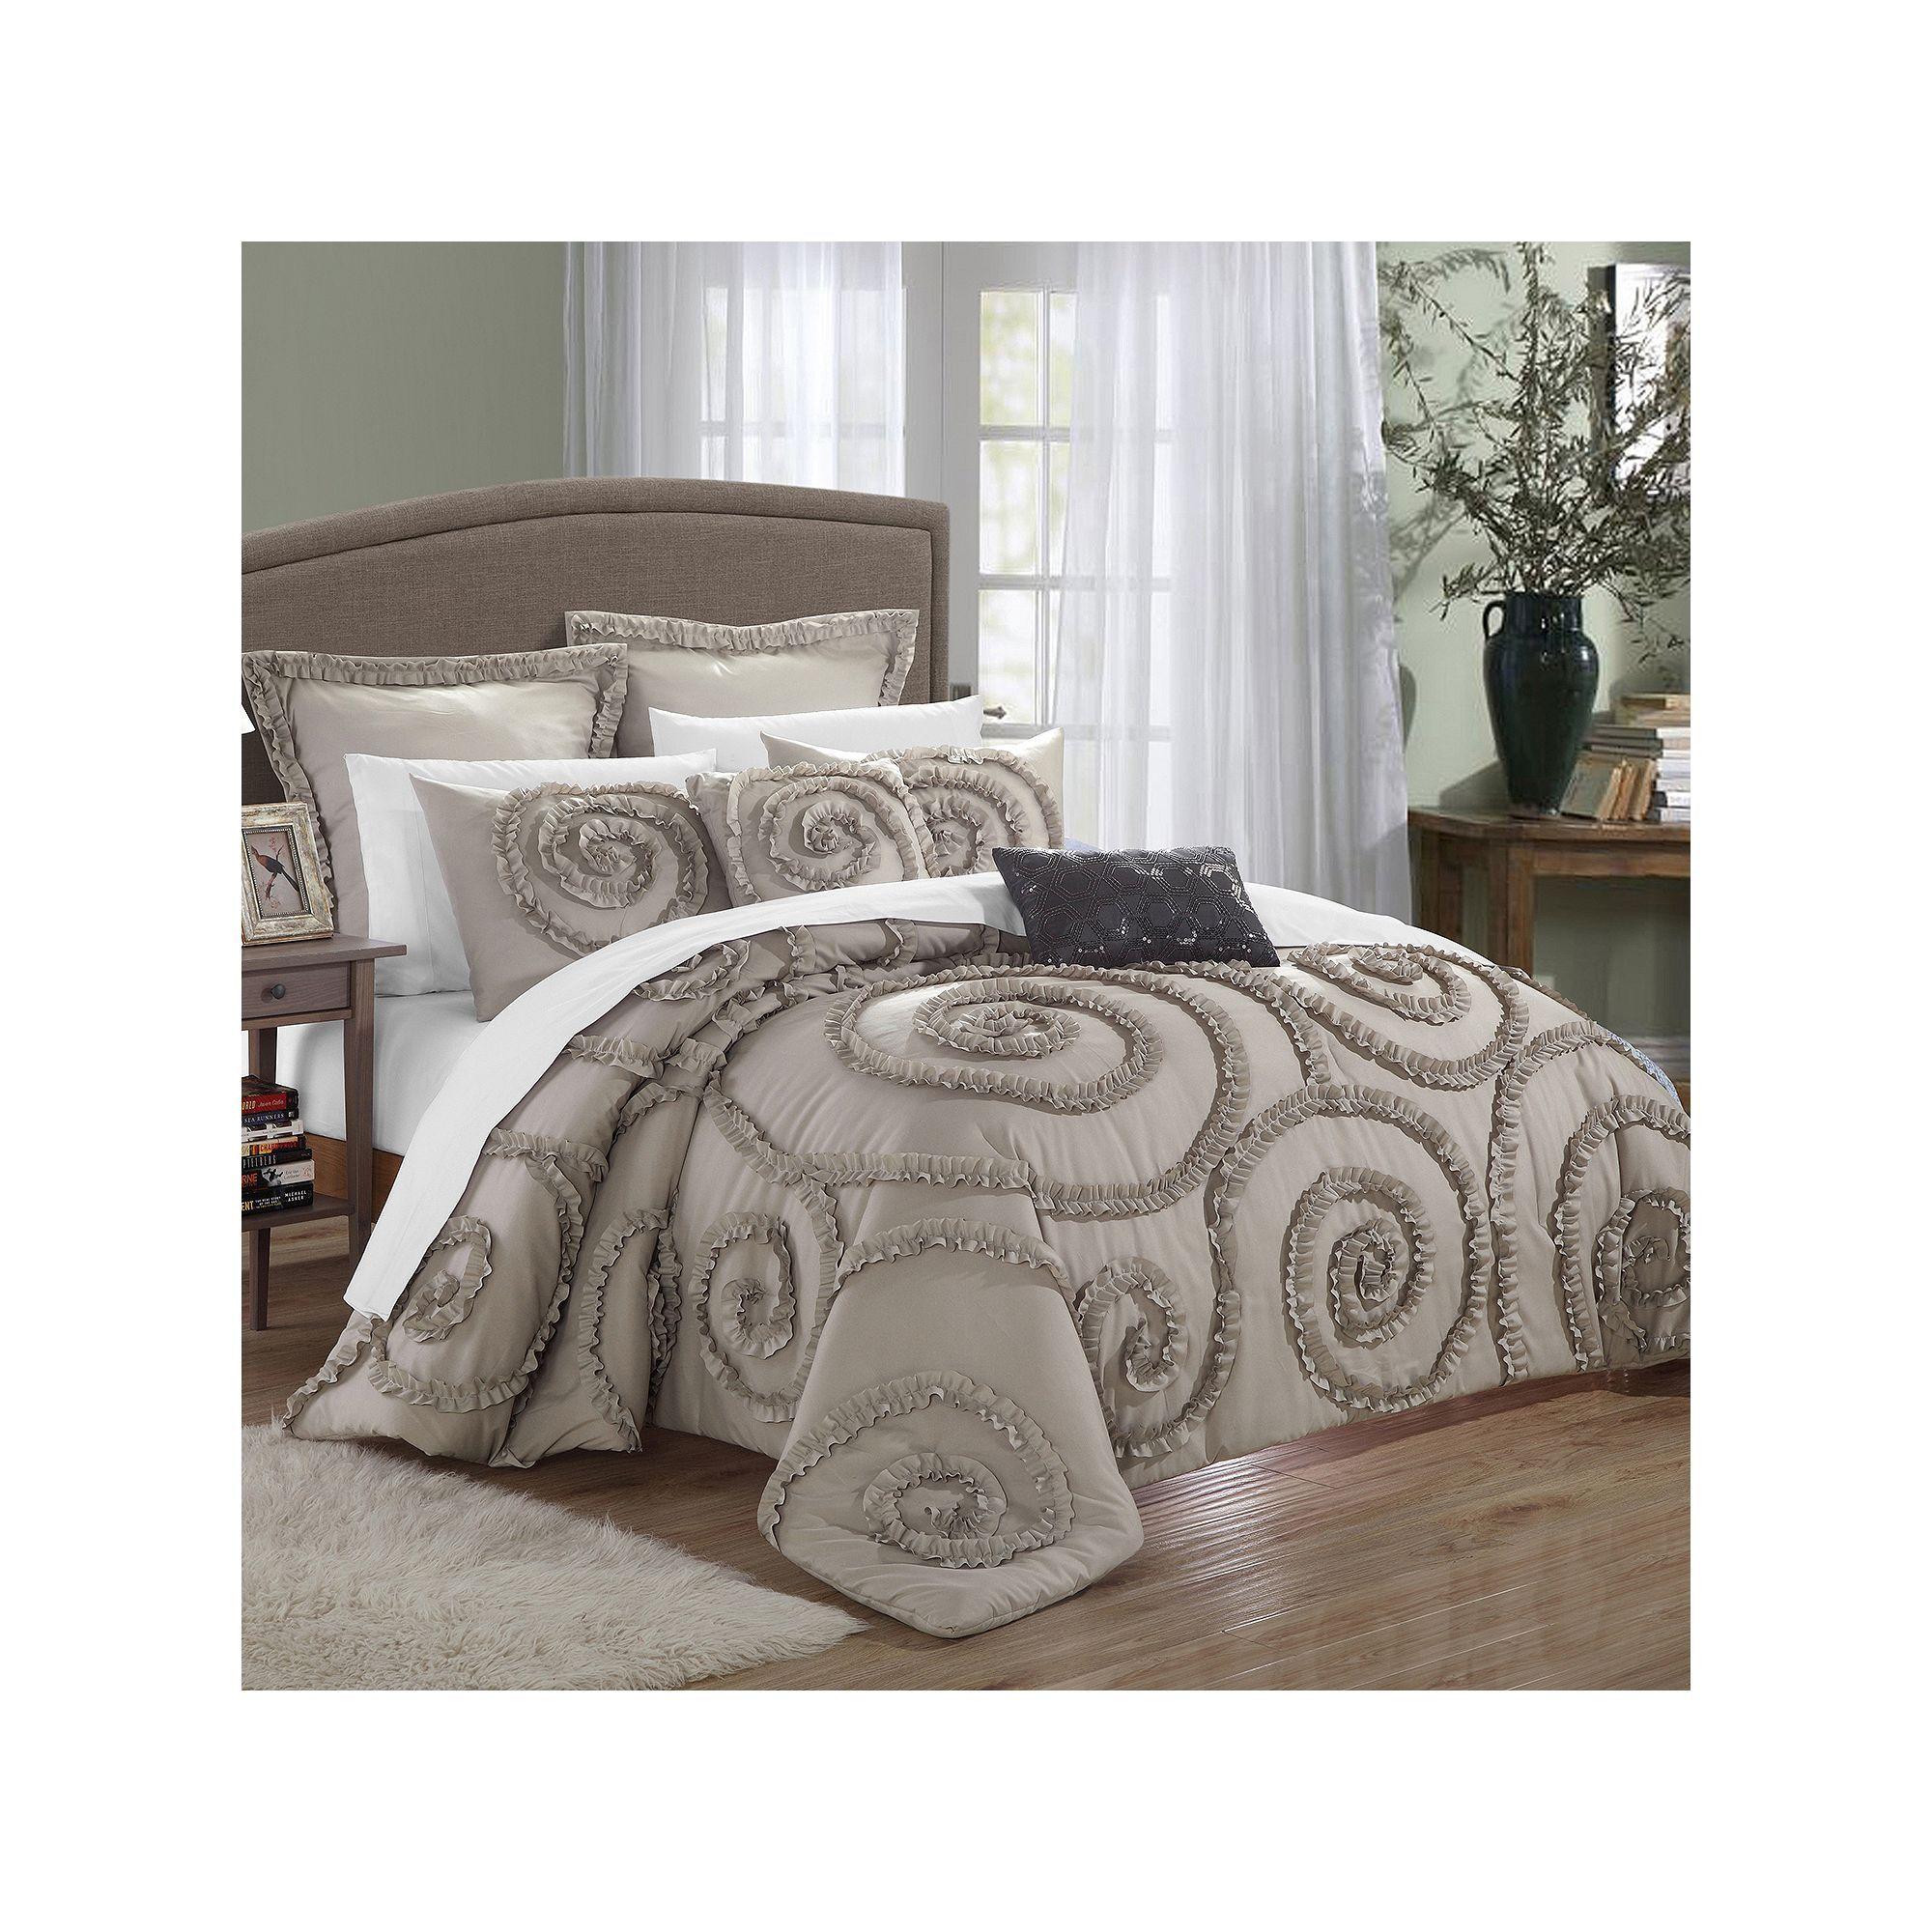 Rosalia 11 Pc Bed Set Taupe Comforter Comforter Sets Grey Comforter